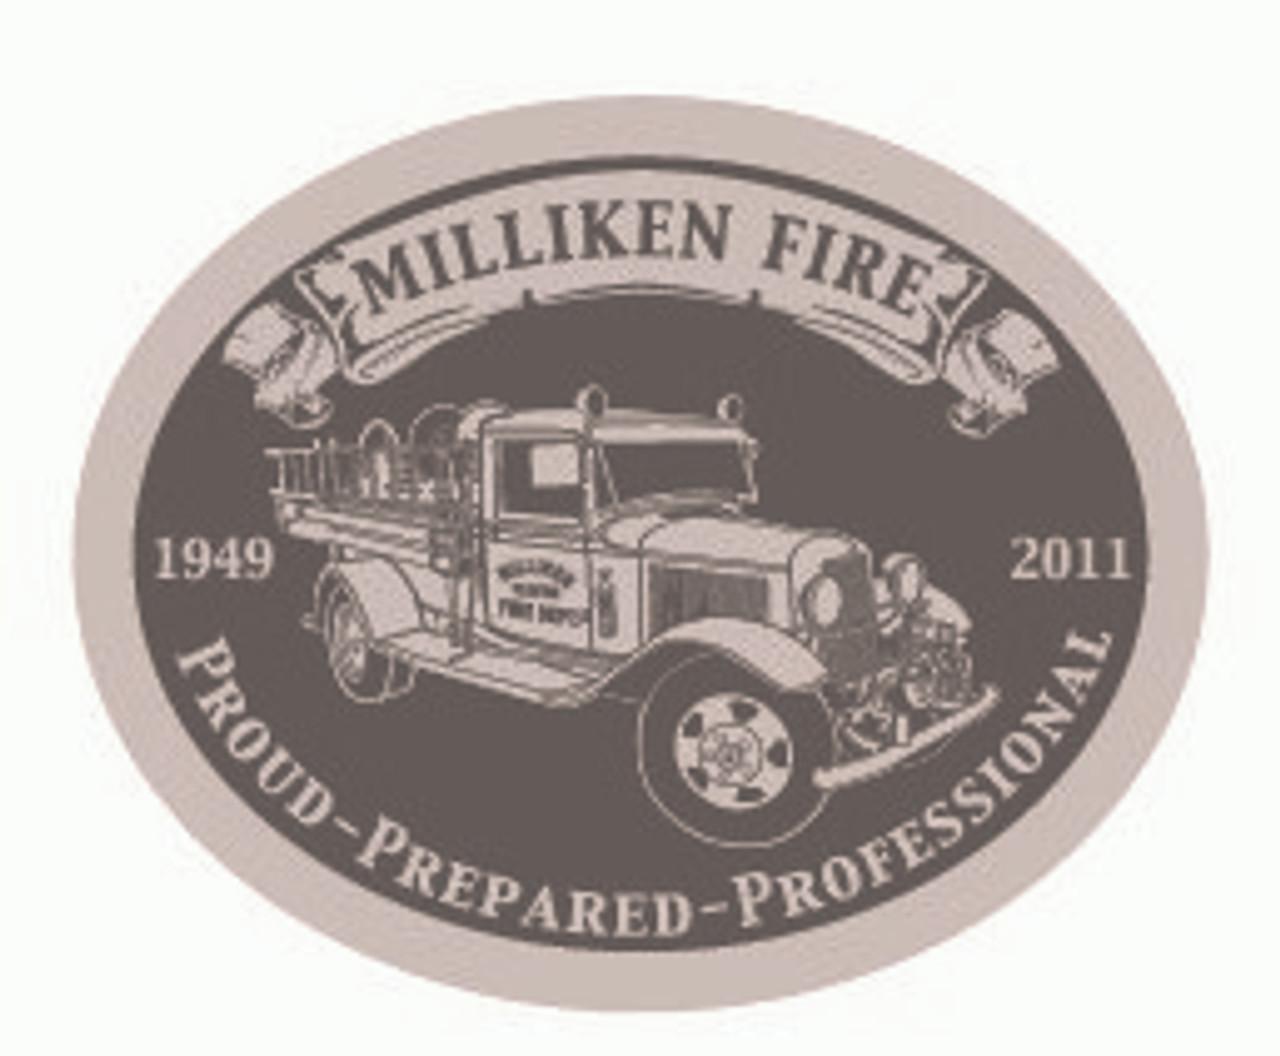 Milliken Fire Department Buckle (RESTRICTED)